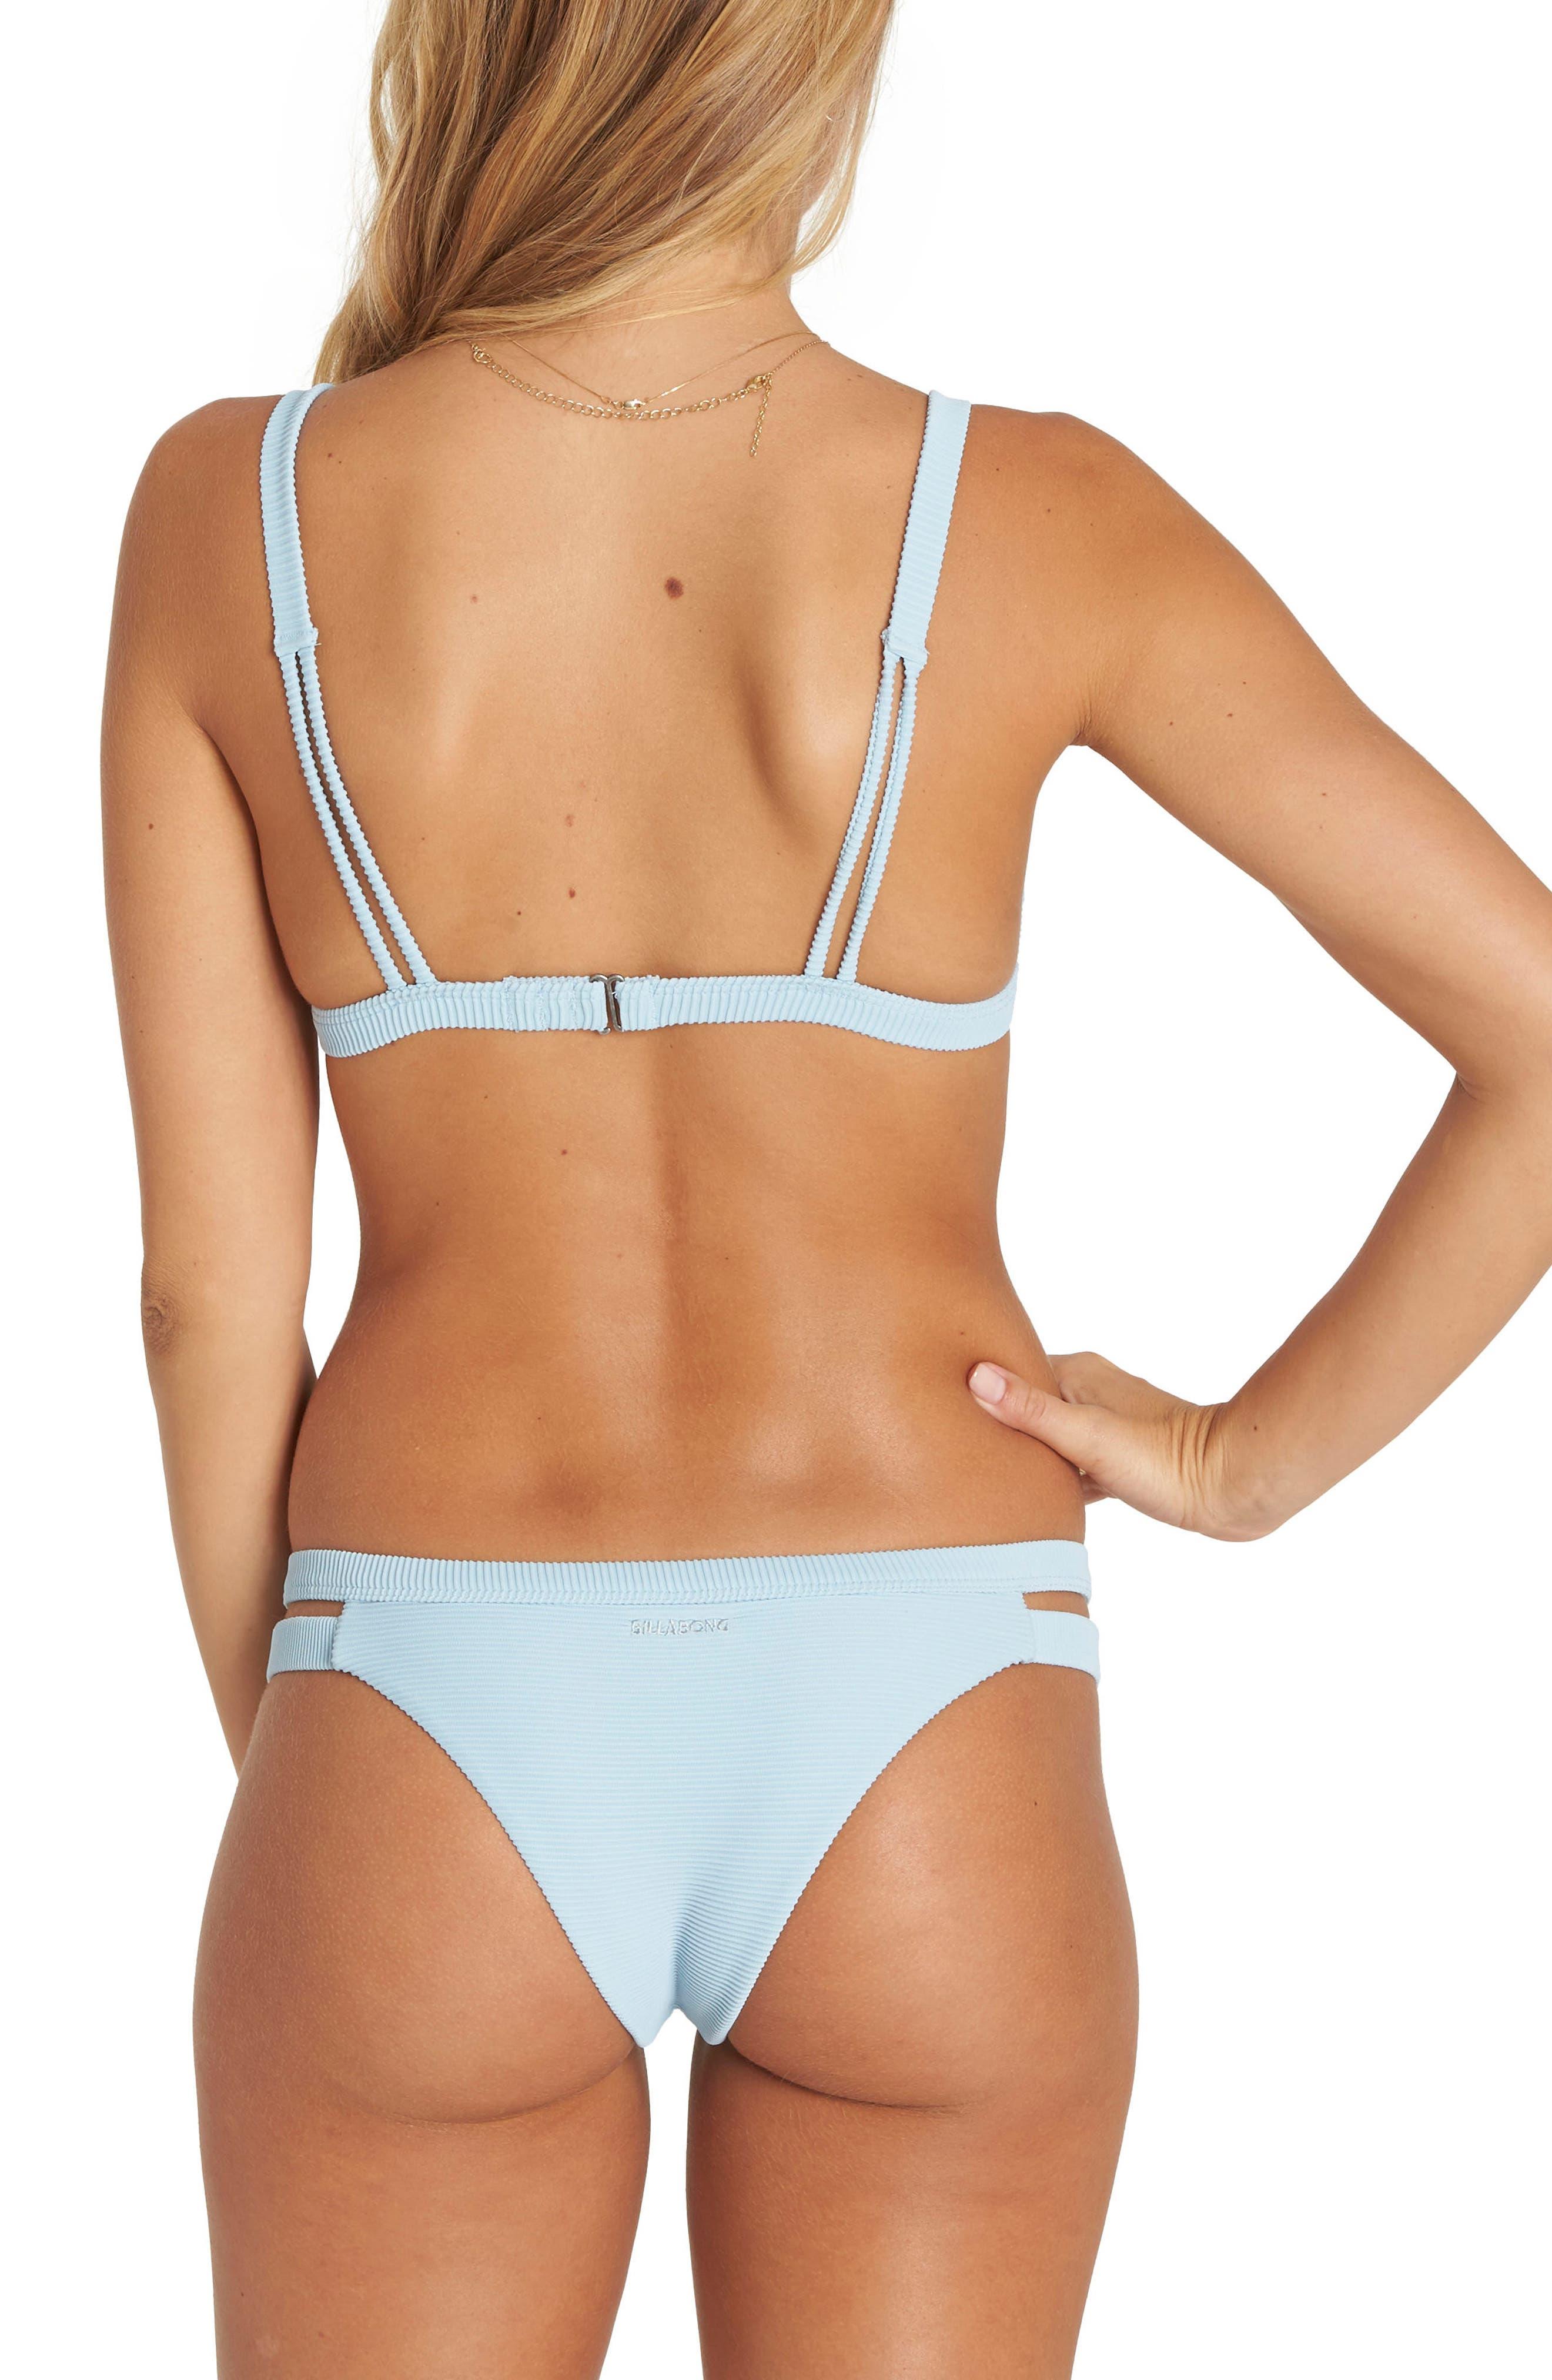 Tanlines Triangle Bikini Top,                             Alternate thumbnail 2, color,                             410